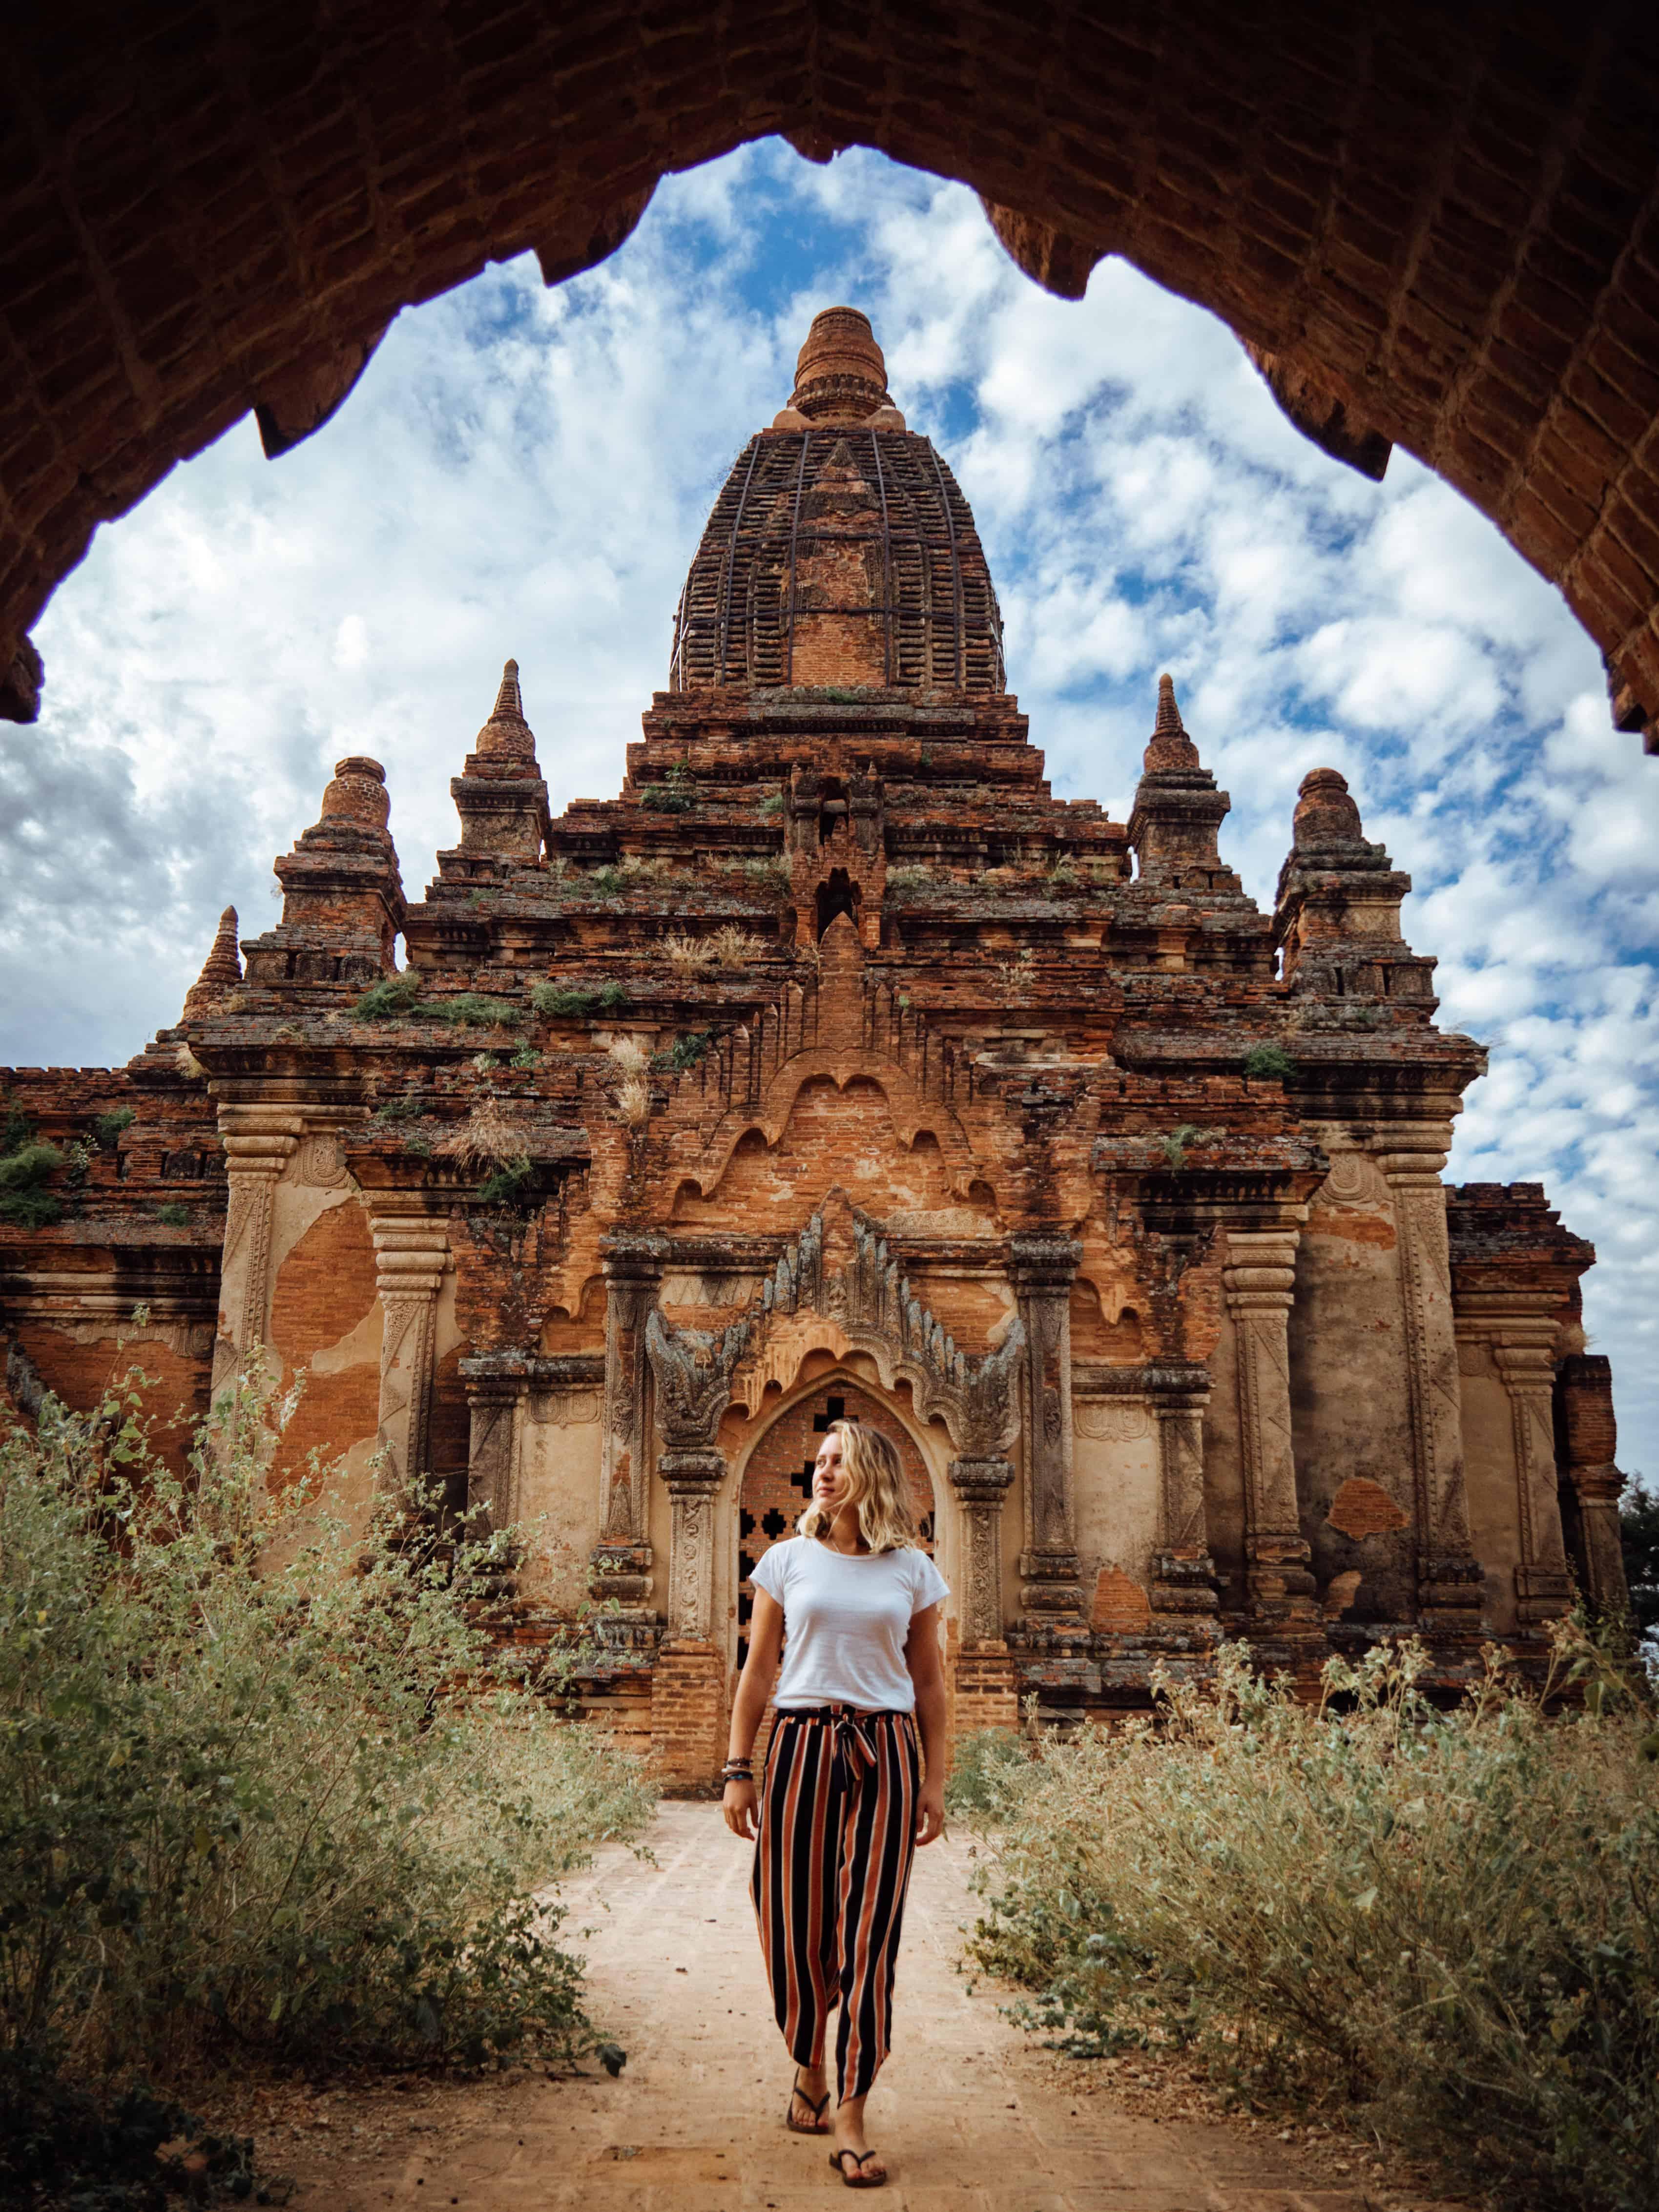 things to do in bagan, what to do in bagan, bagan, bagan tour, e bike bagan, bagan travel, bagan temples, bagan attractions, new bagan, old bagan, bagan itinerary, sunset bagan, ta wet hpaya